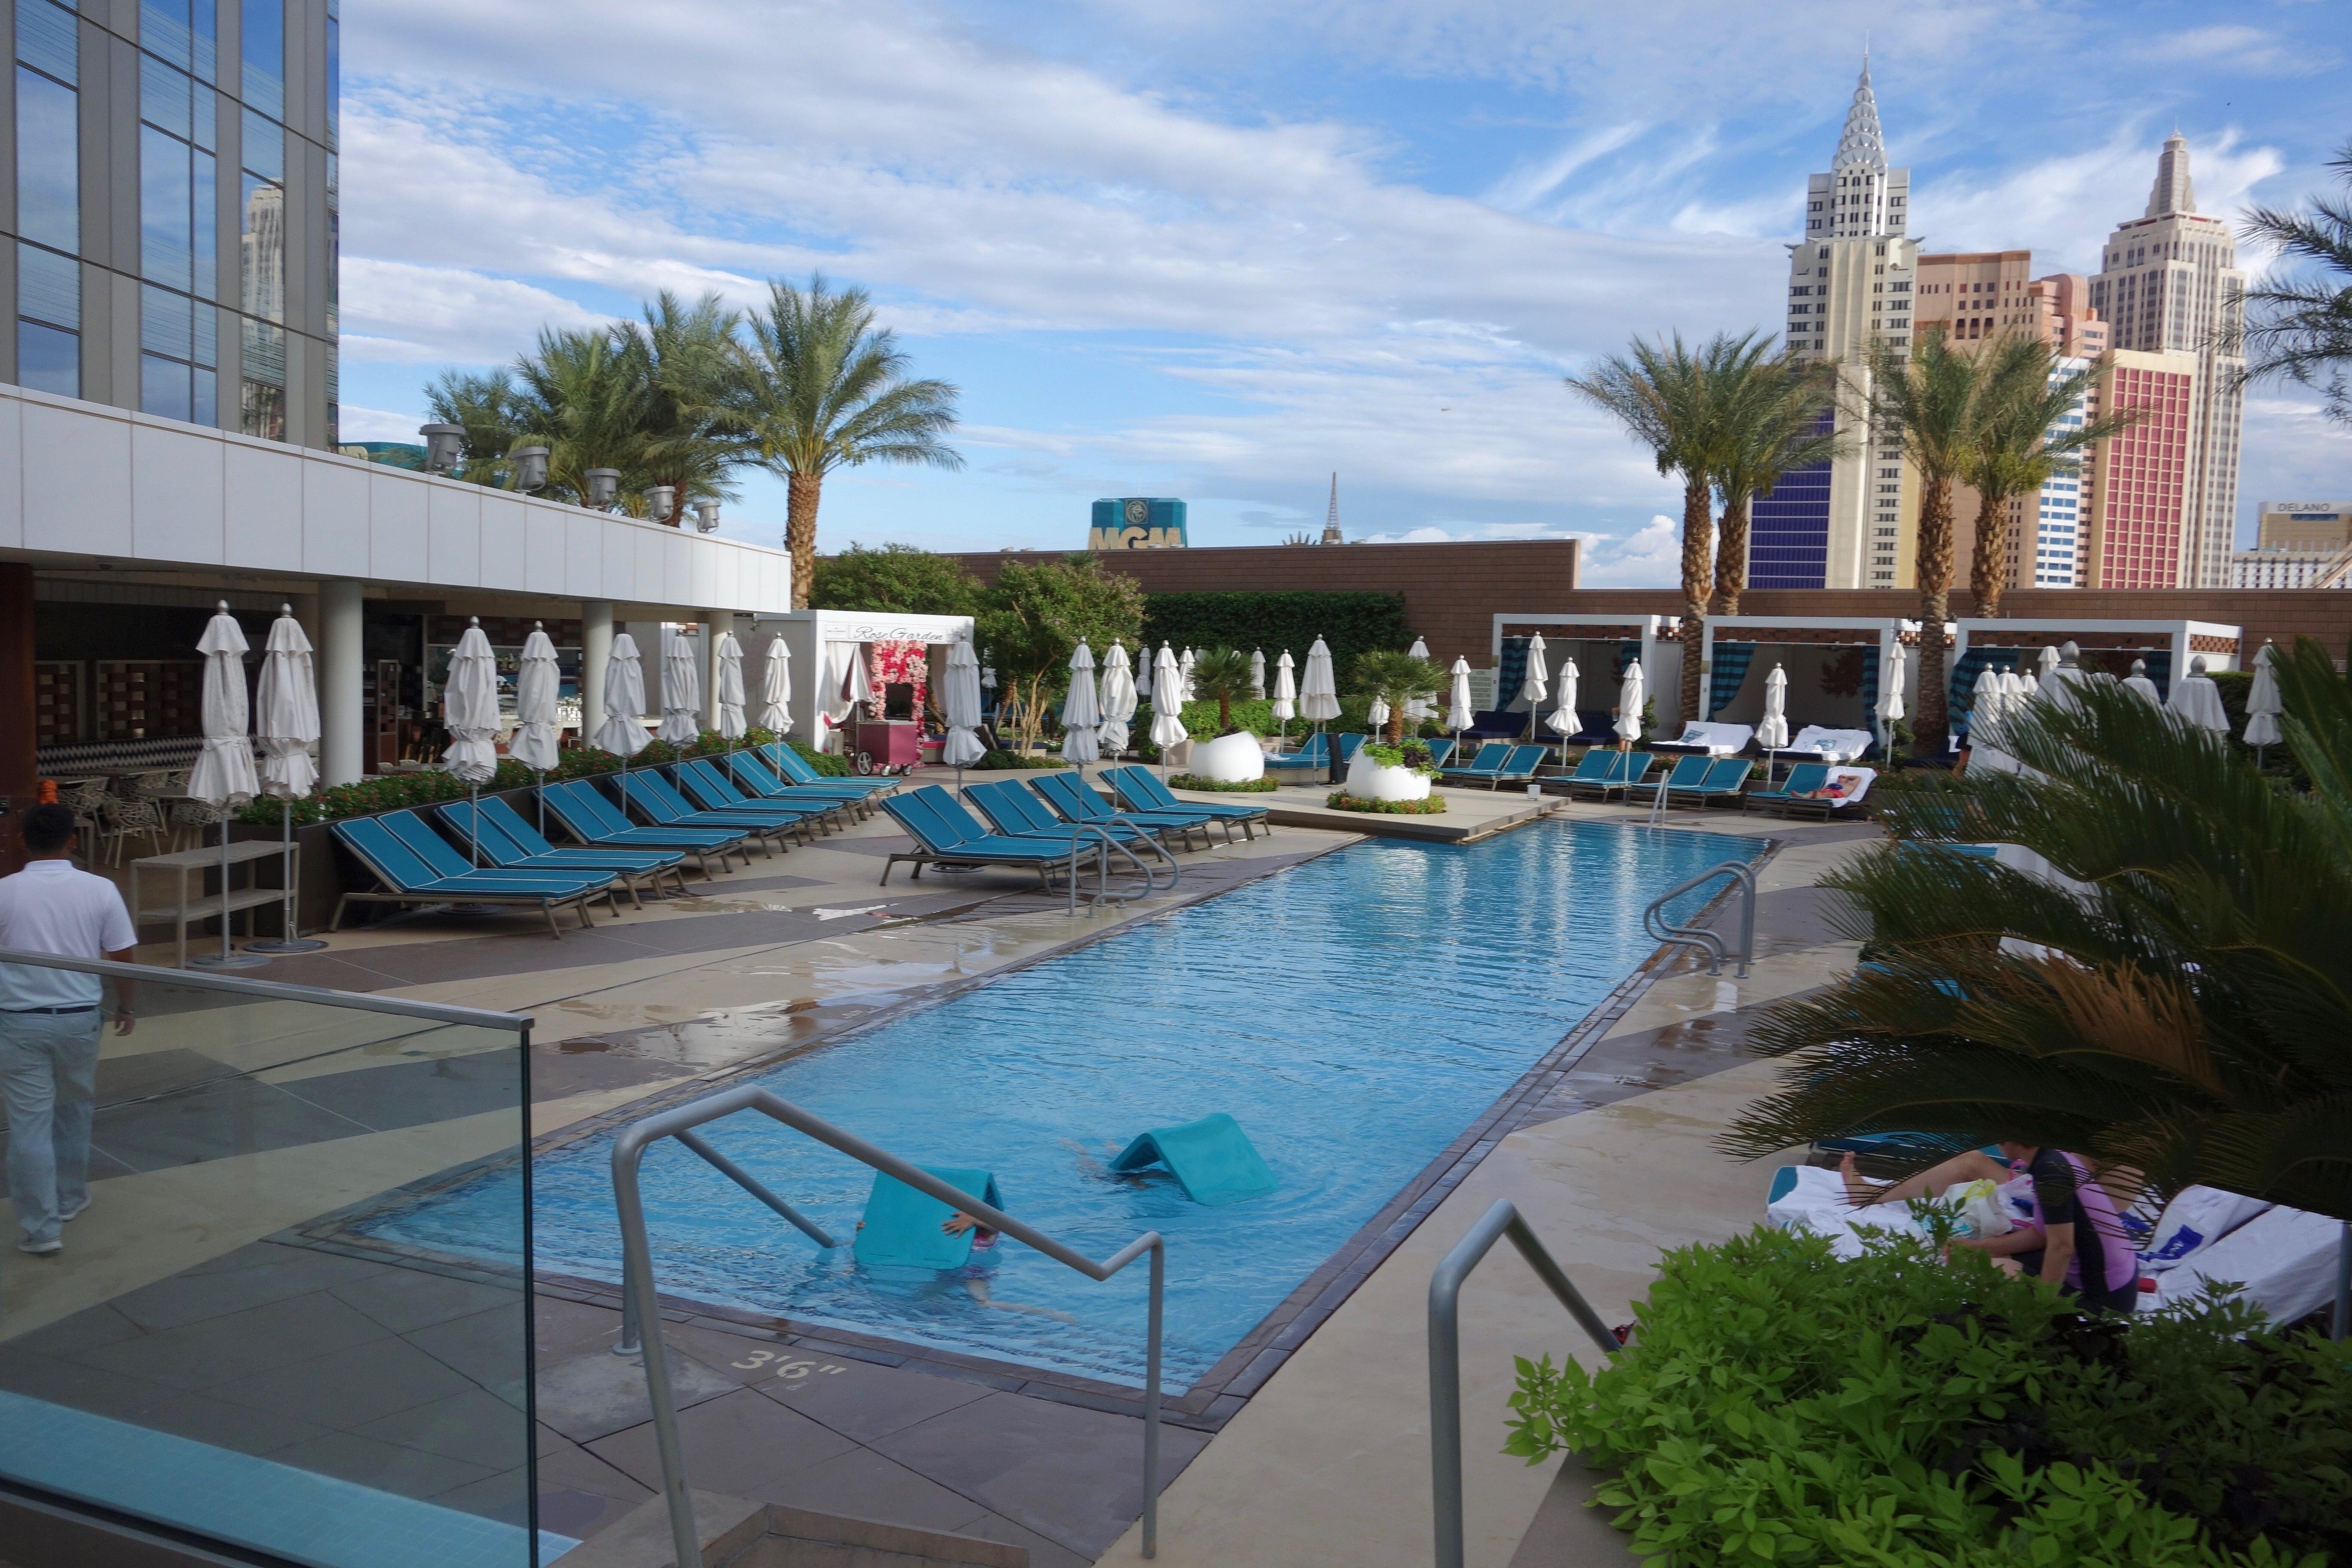 Mandarin Oriental Las Vegas Hotel Review | The Points Guy